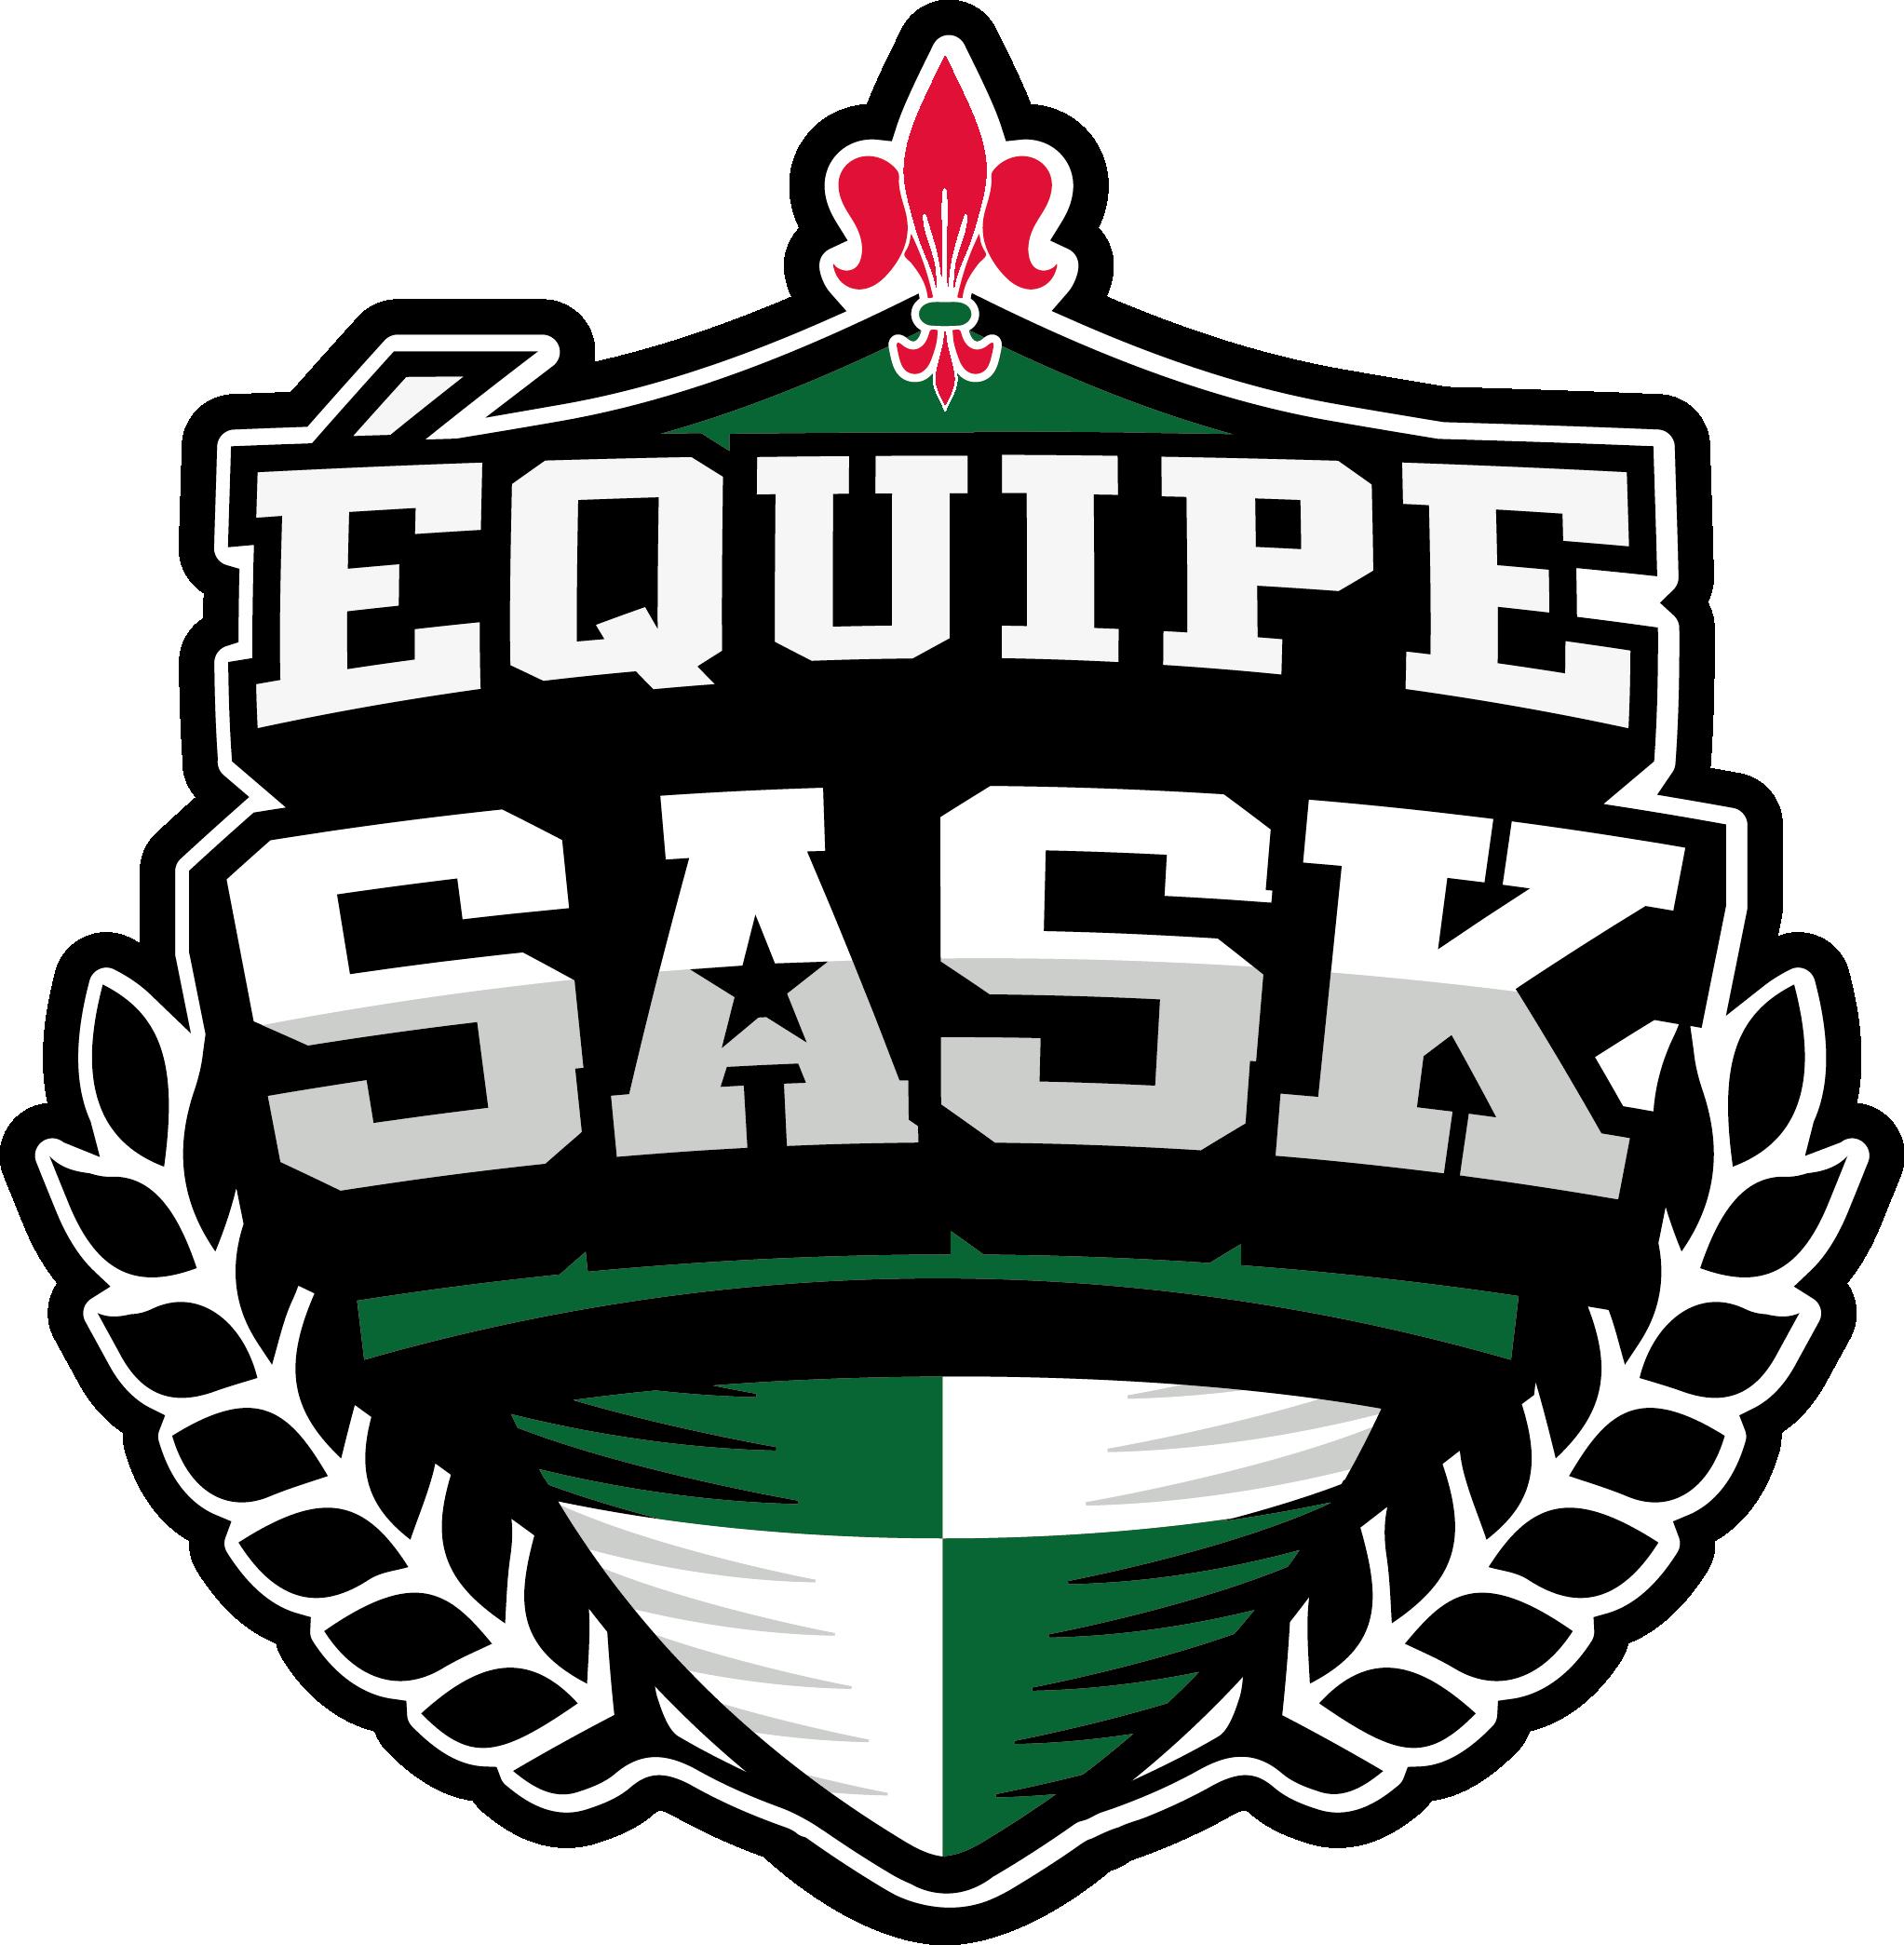 logo équipe saskatchewan